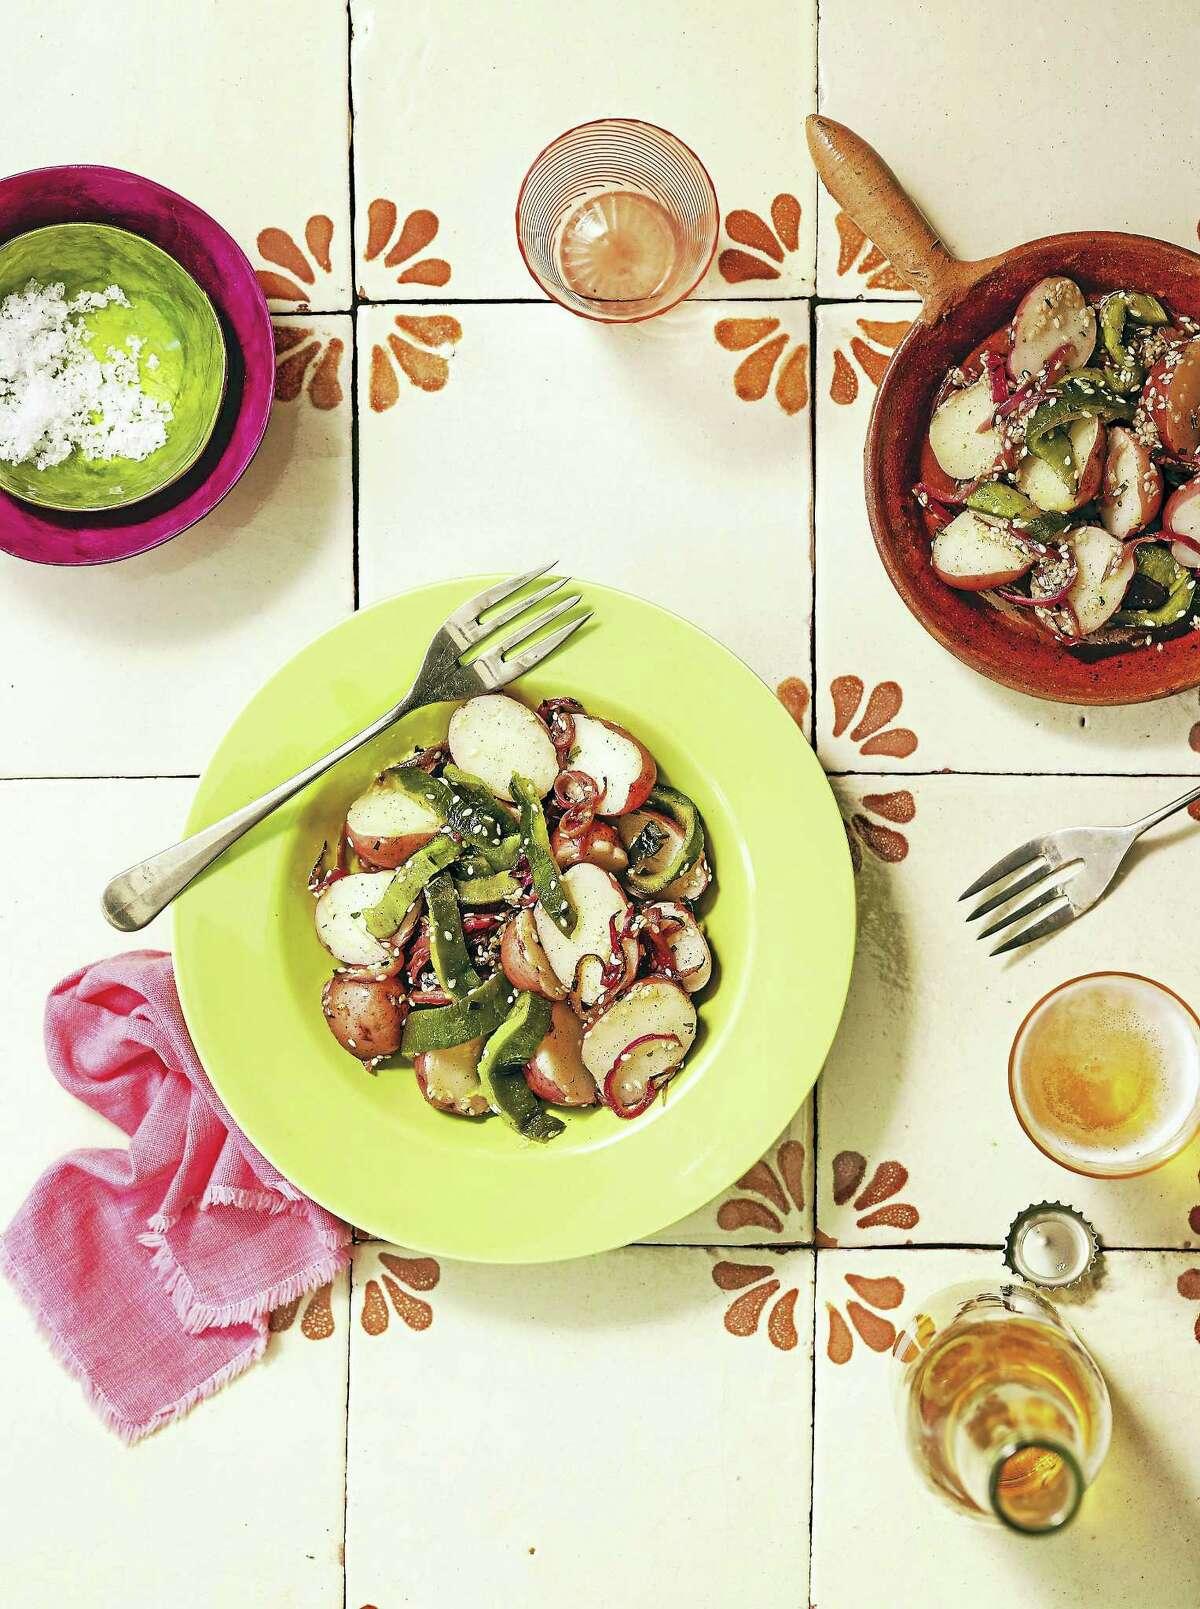 Potato and poblano rajas salad.